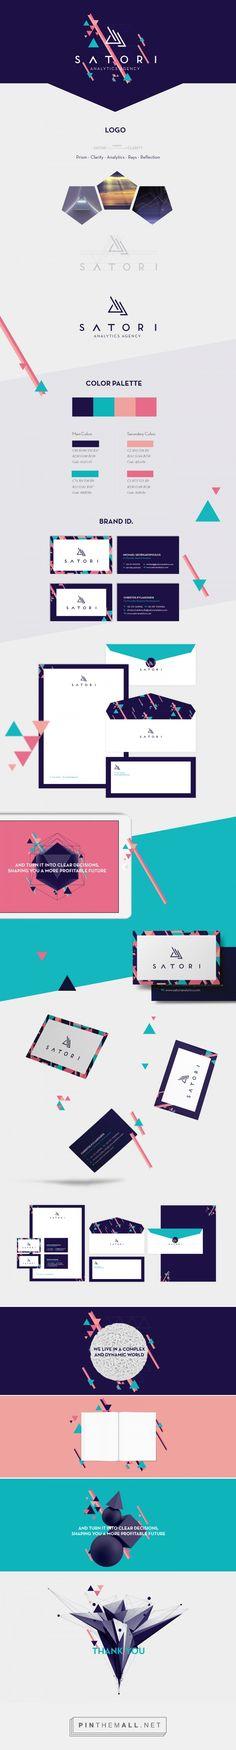 Satori Analytics Agency Branding on Behance   Fivestar Branding – Design and Branding Agency & Inspiration Gallery